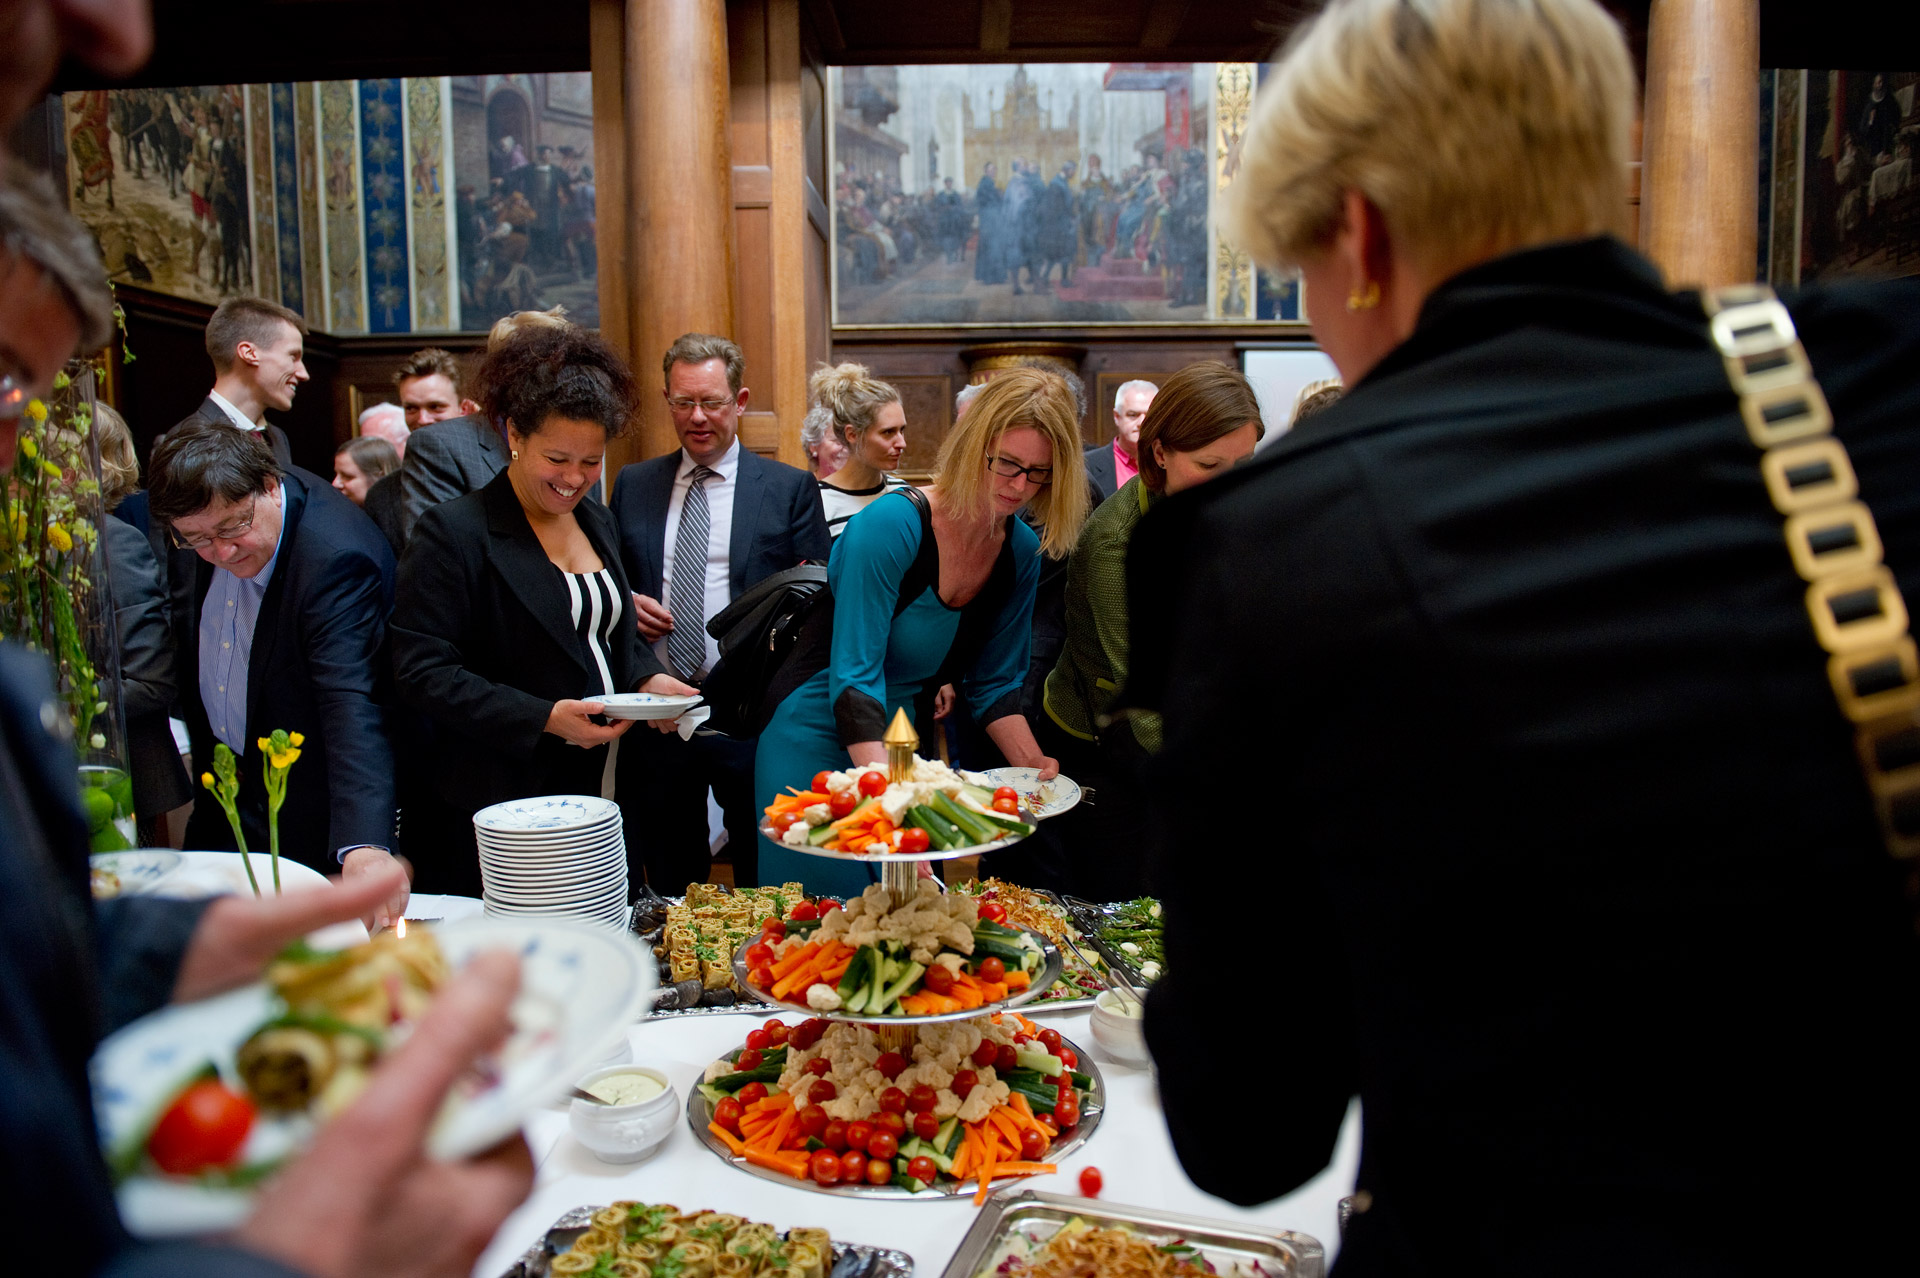 people at the buffet at a Kierkegaard Symposium in Copenhagen University